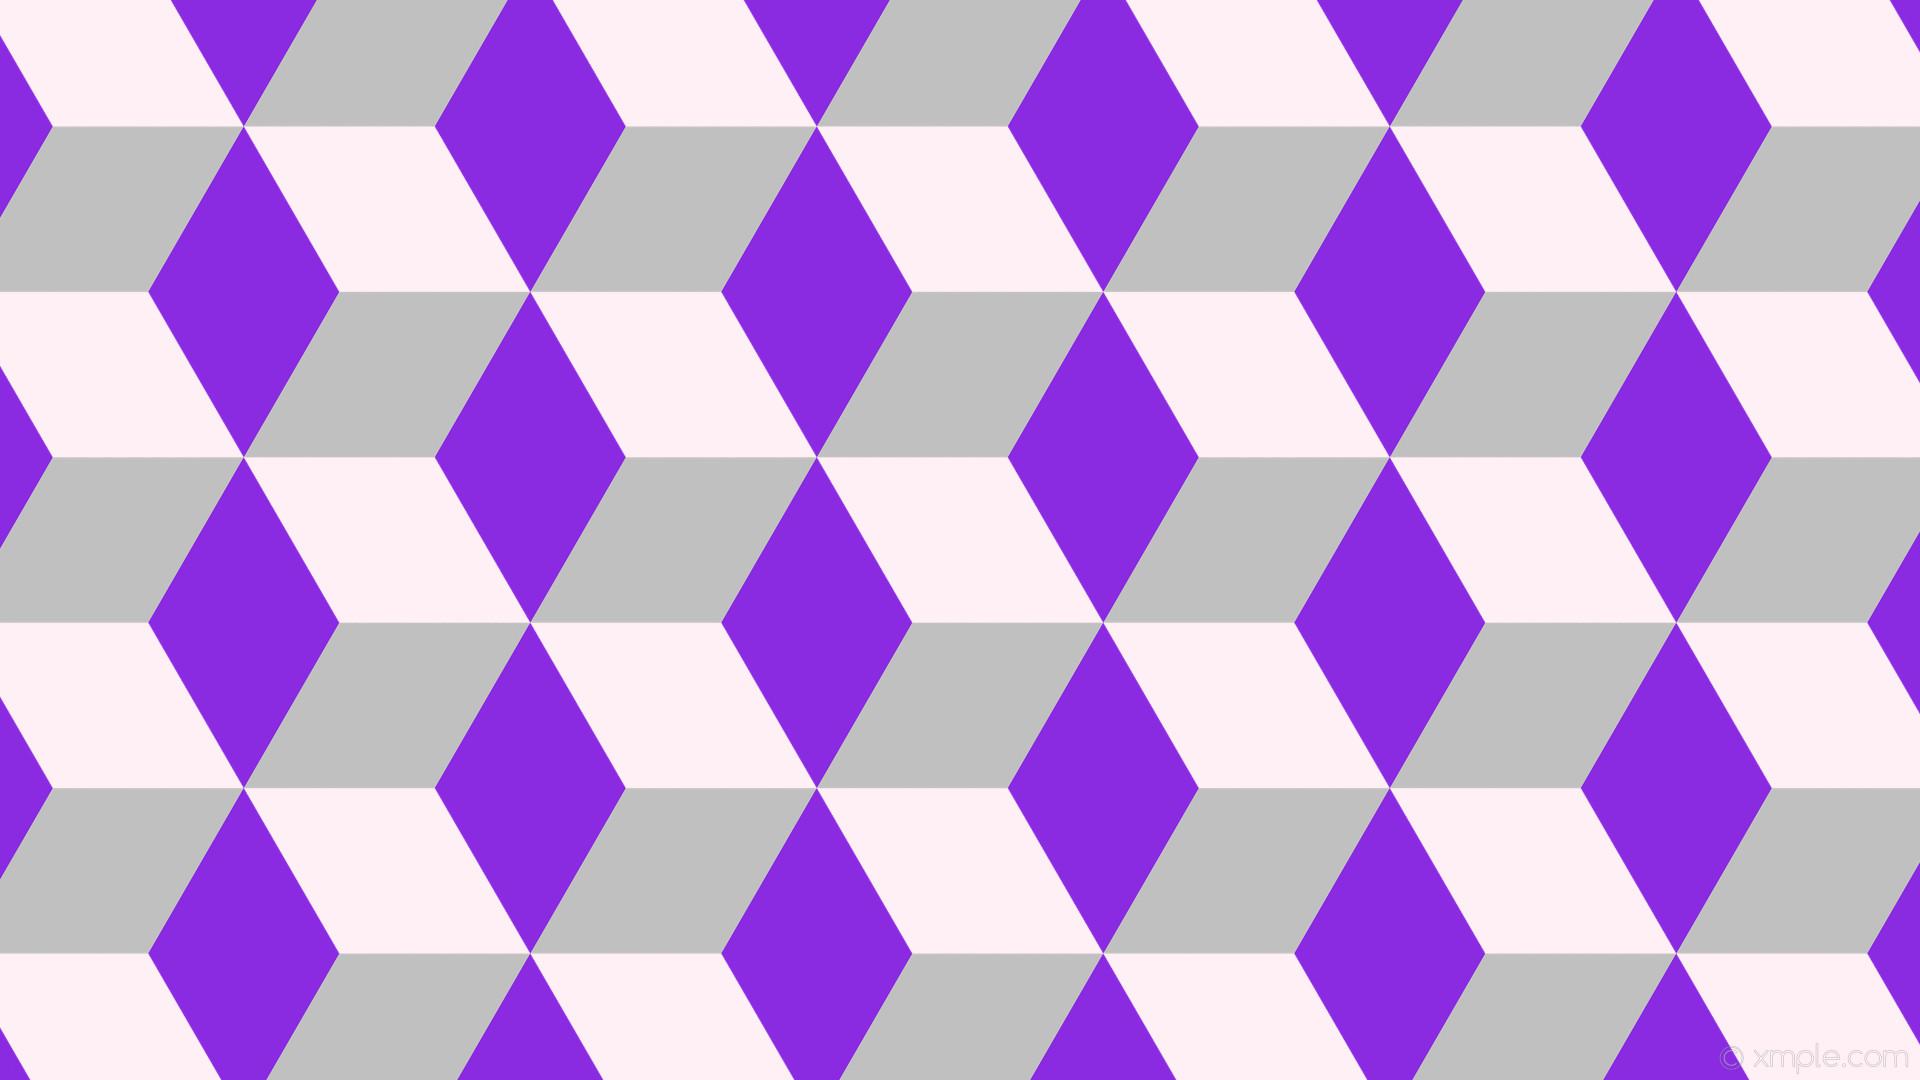 wallpaper purple 3d cubes grey white lavender blush blue violet silver  #fff0f5 #8a2be2 #